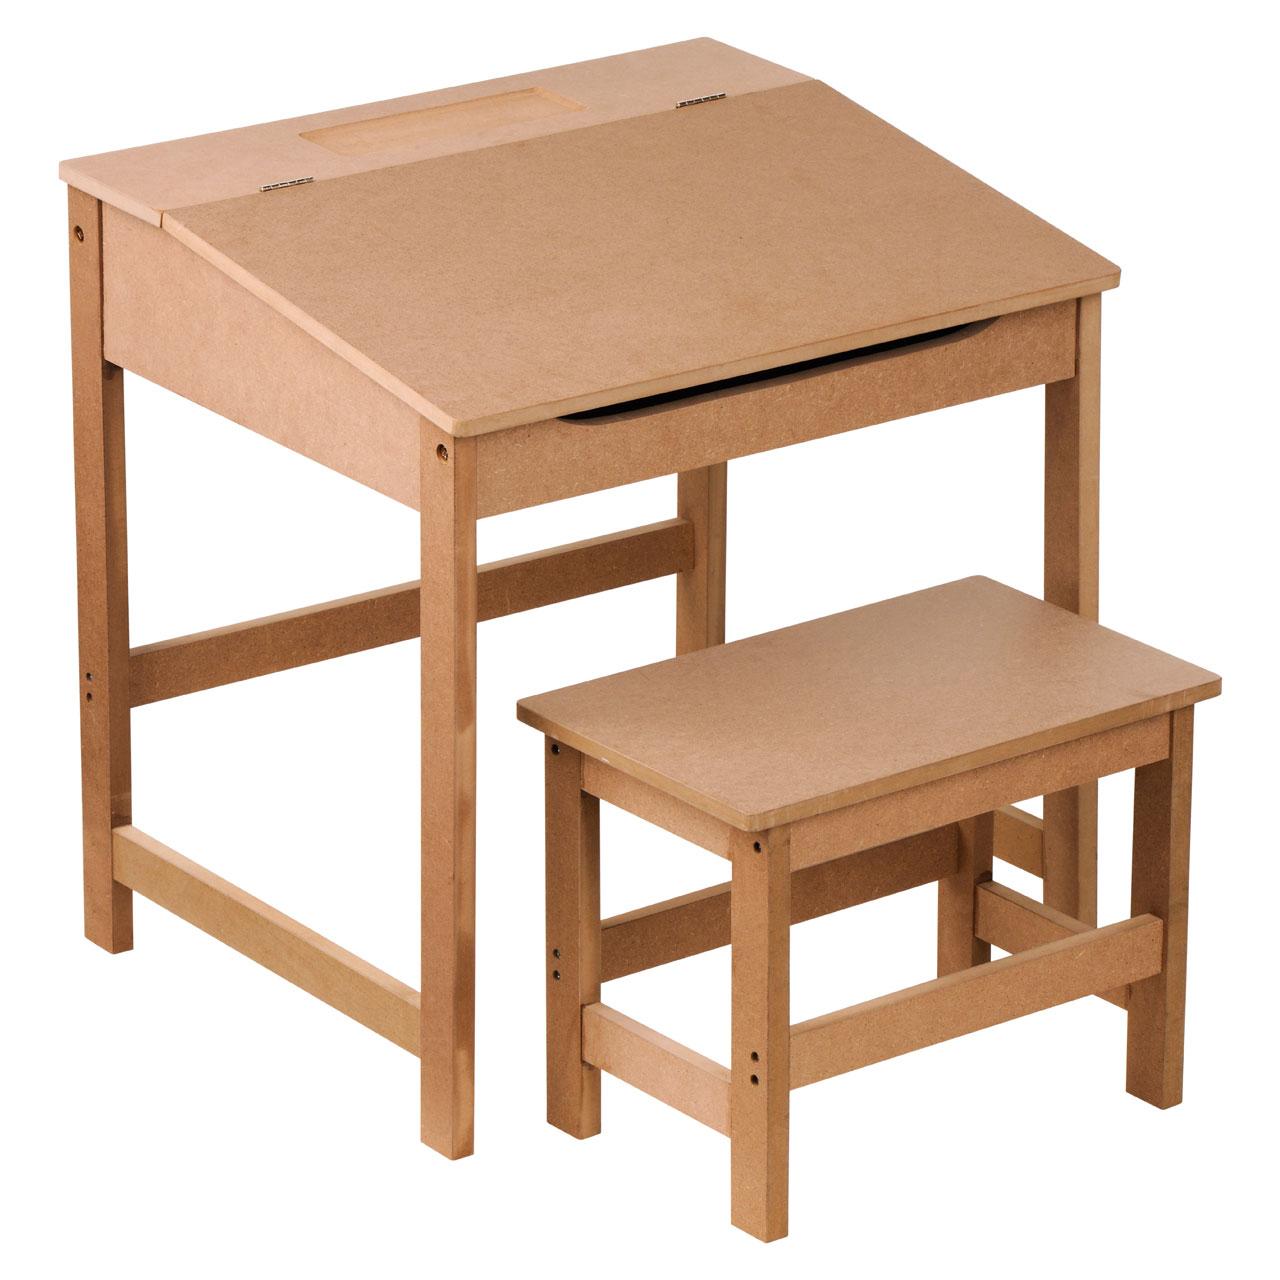 Children S Natural Brown Wood Desk Stool Hinged Lid Storage Organizing Rack